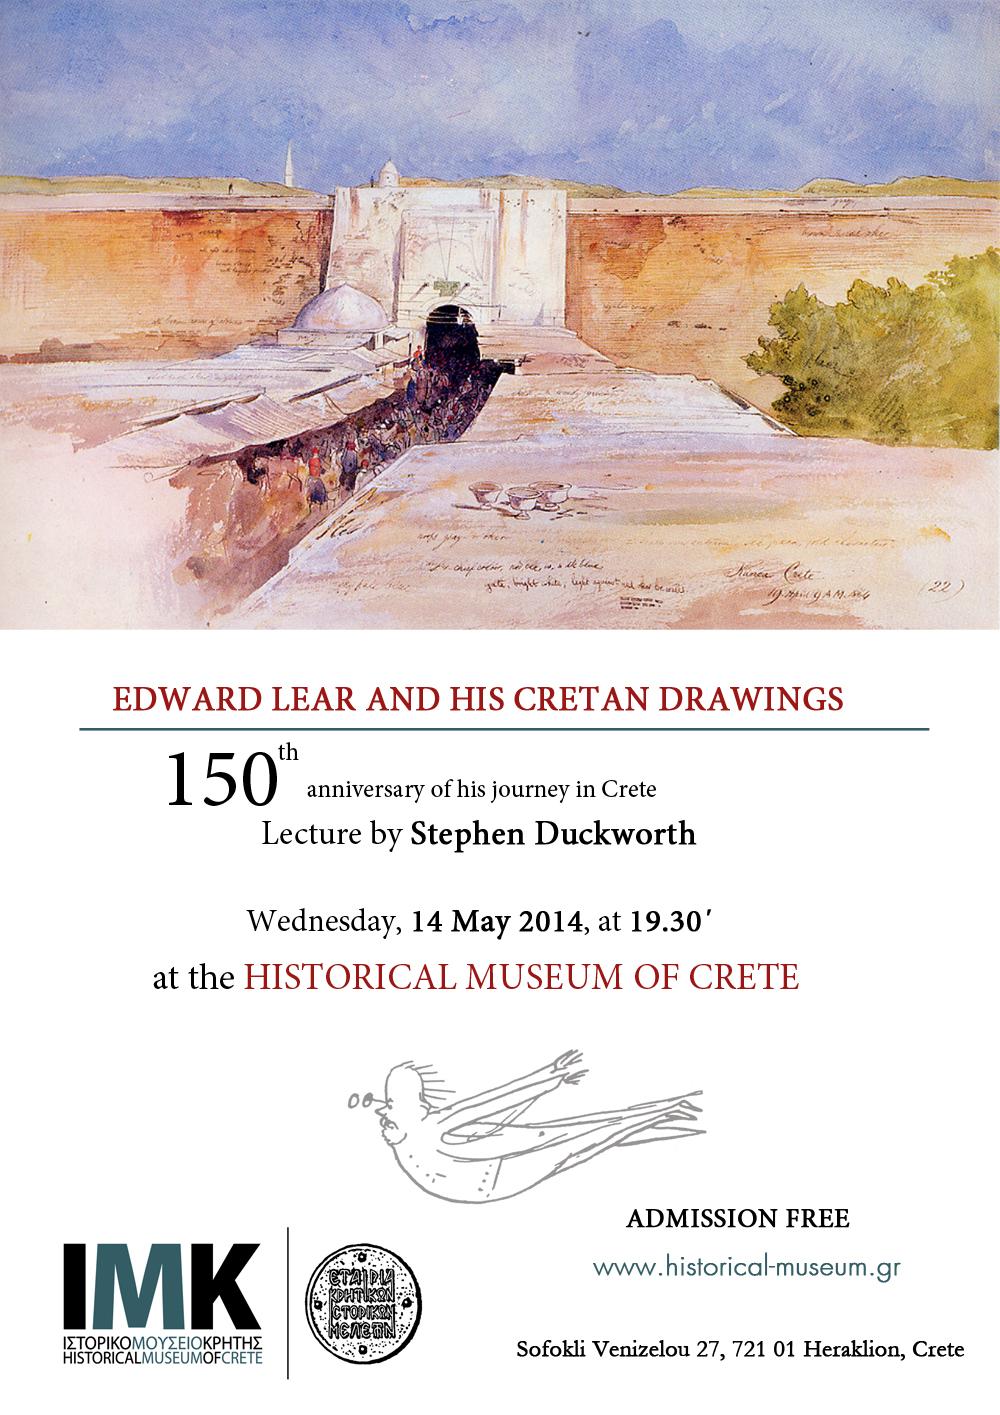 Lear event Crete - Stephen Duckworth